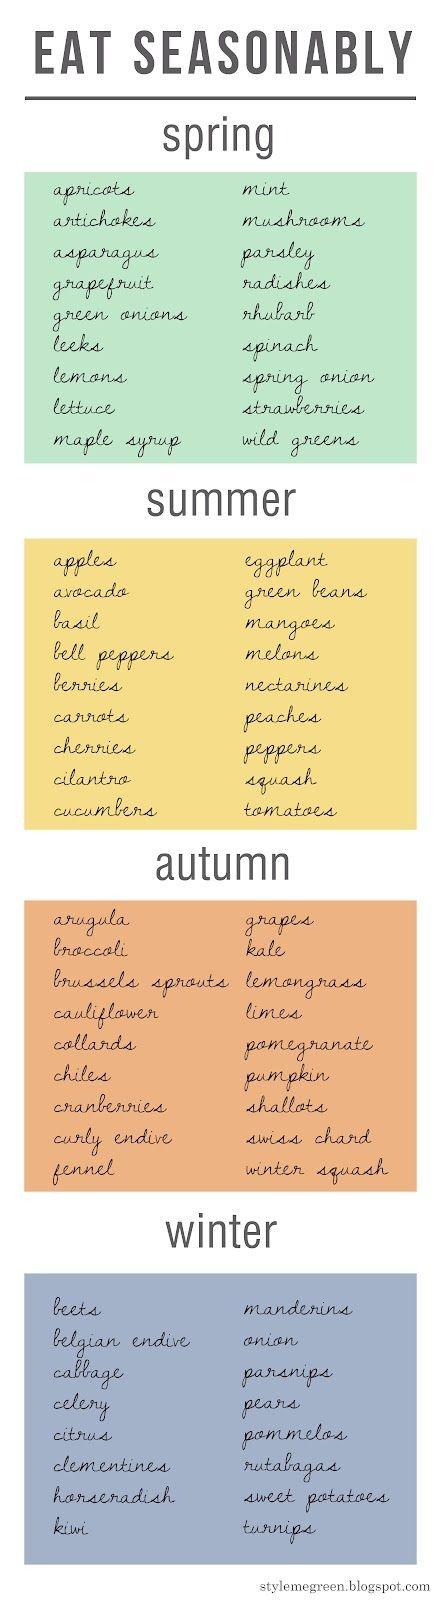 Eat seasonably: when fruits & veggies are in season & at the peak of flavor